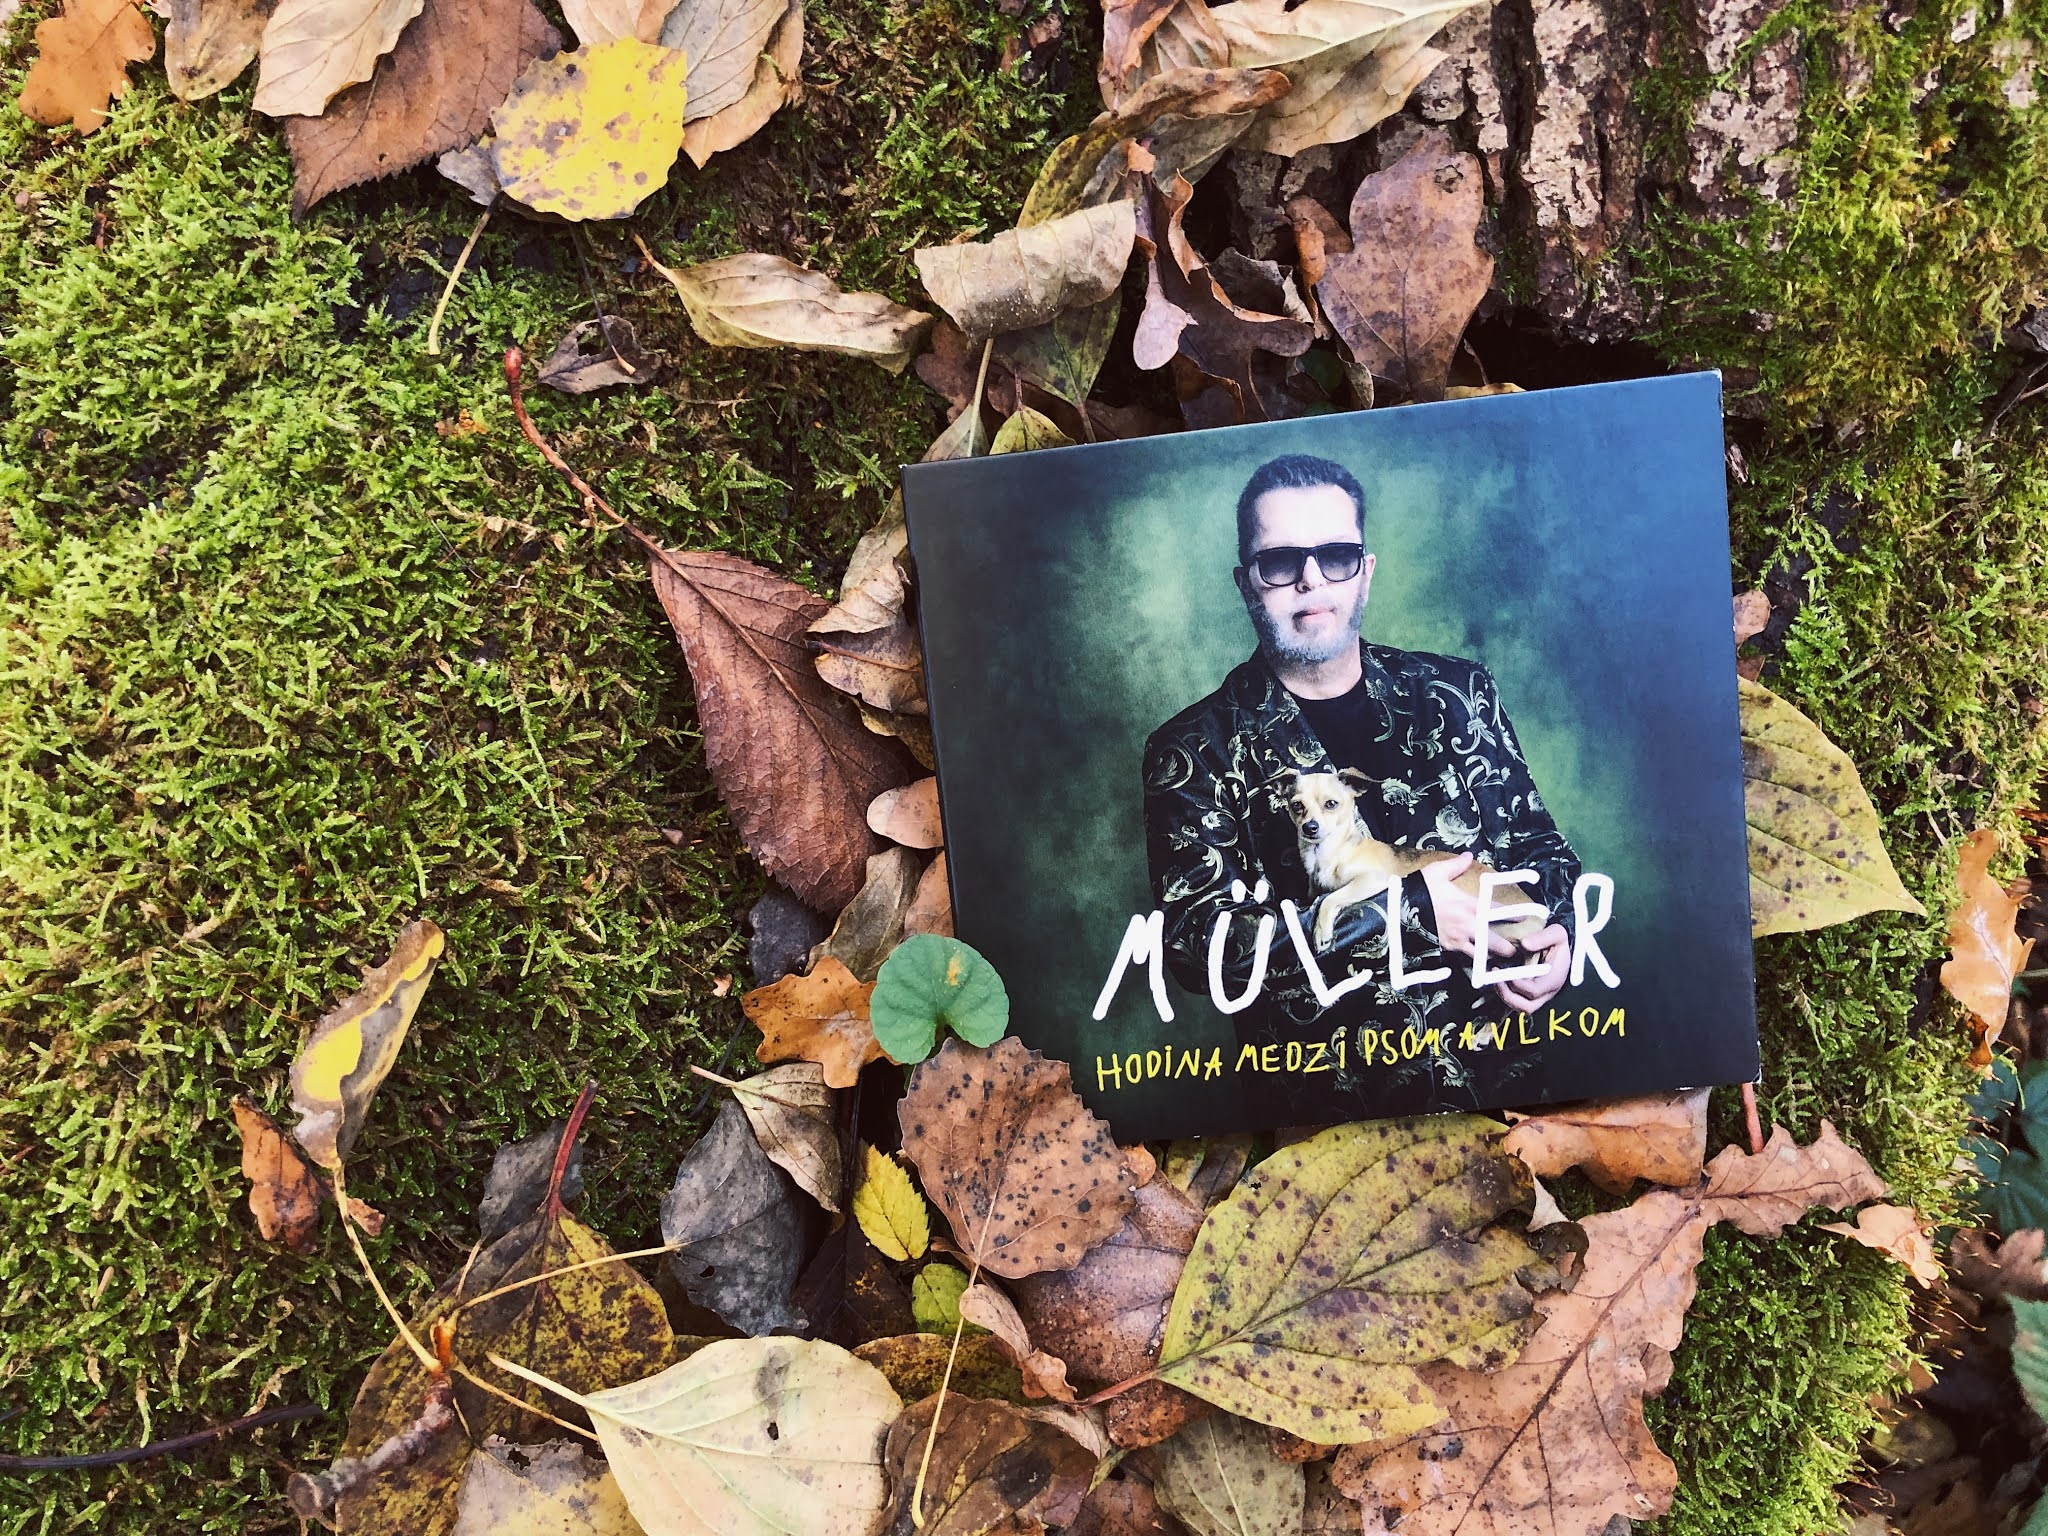 RECENZIA NA ALBUM:  Hodina medzi psom a vlkom - Richard Müller